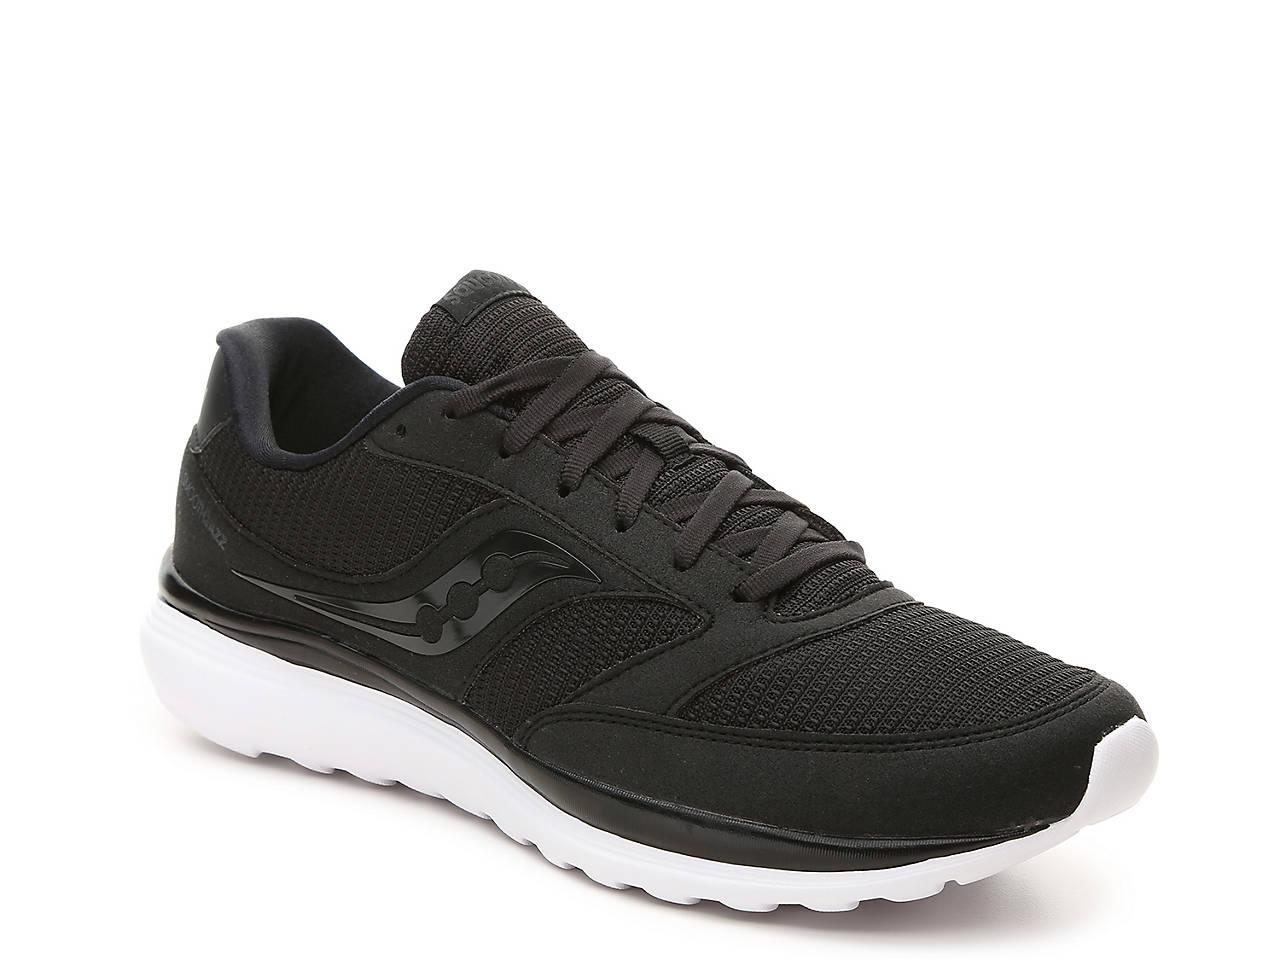 8eb2ec9afff8 Saucony Smooth Jazz Training Shoe - Men s Men s Shoes